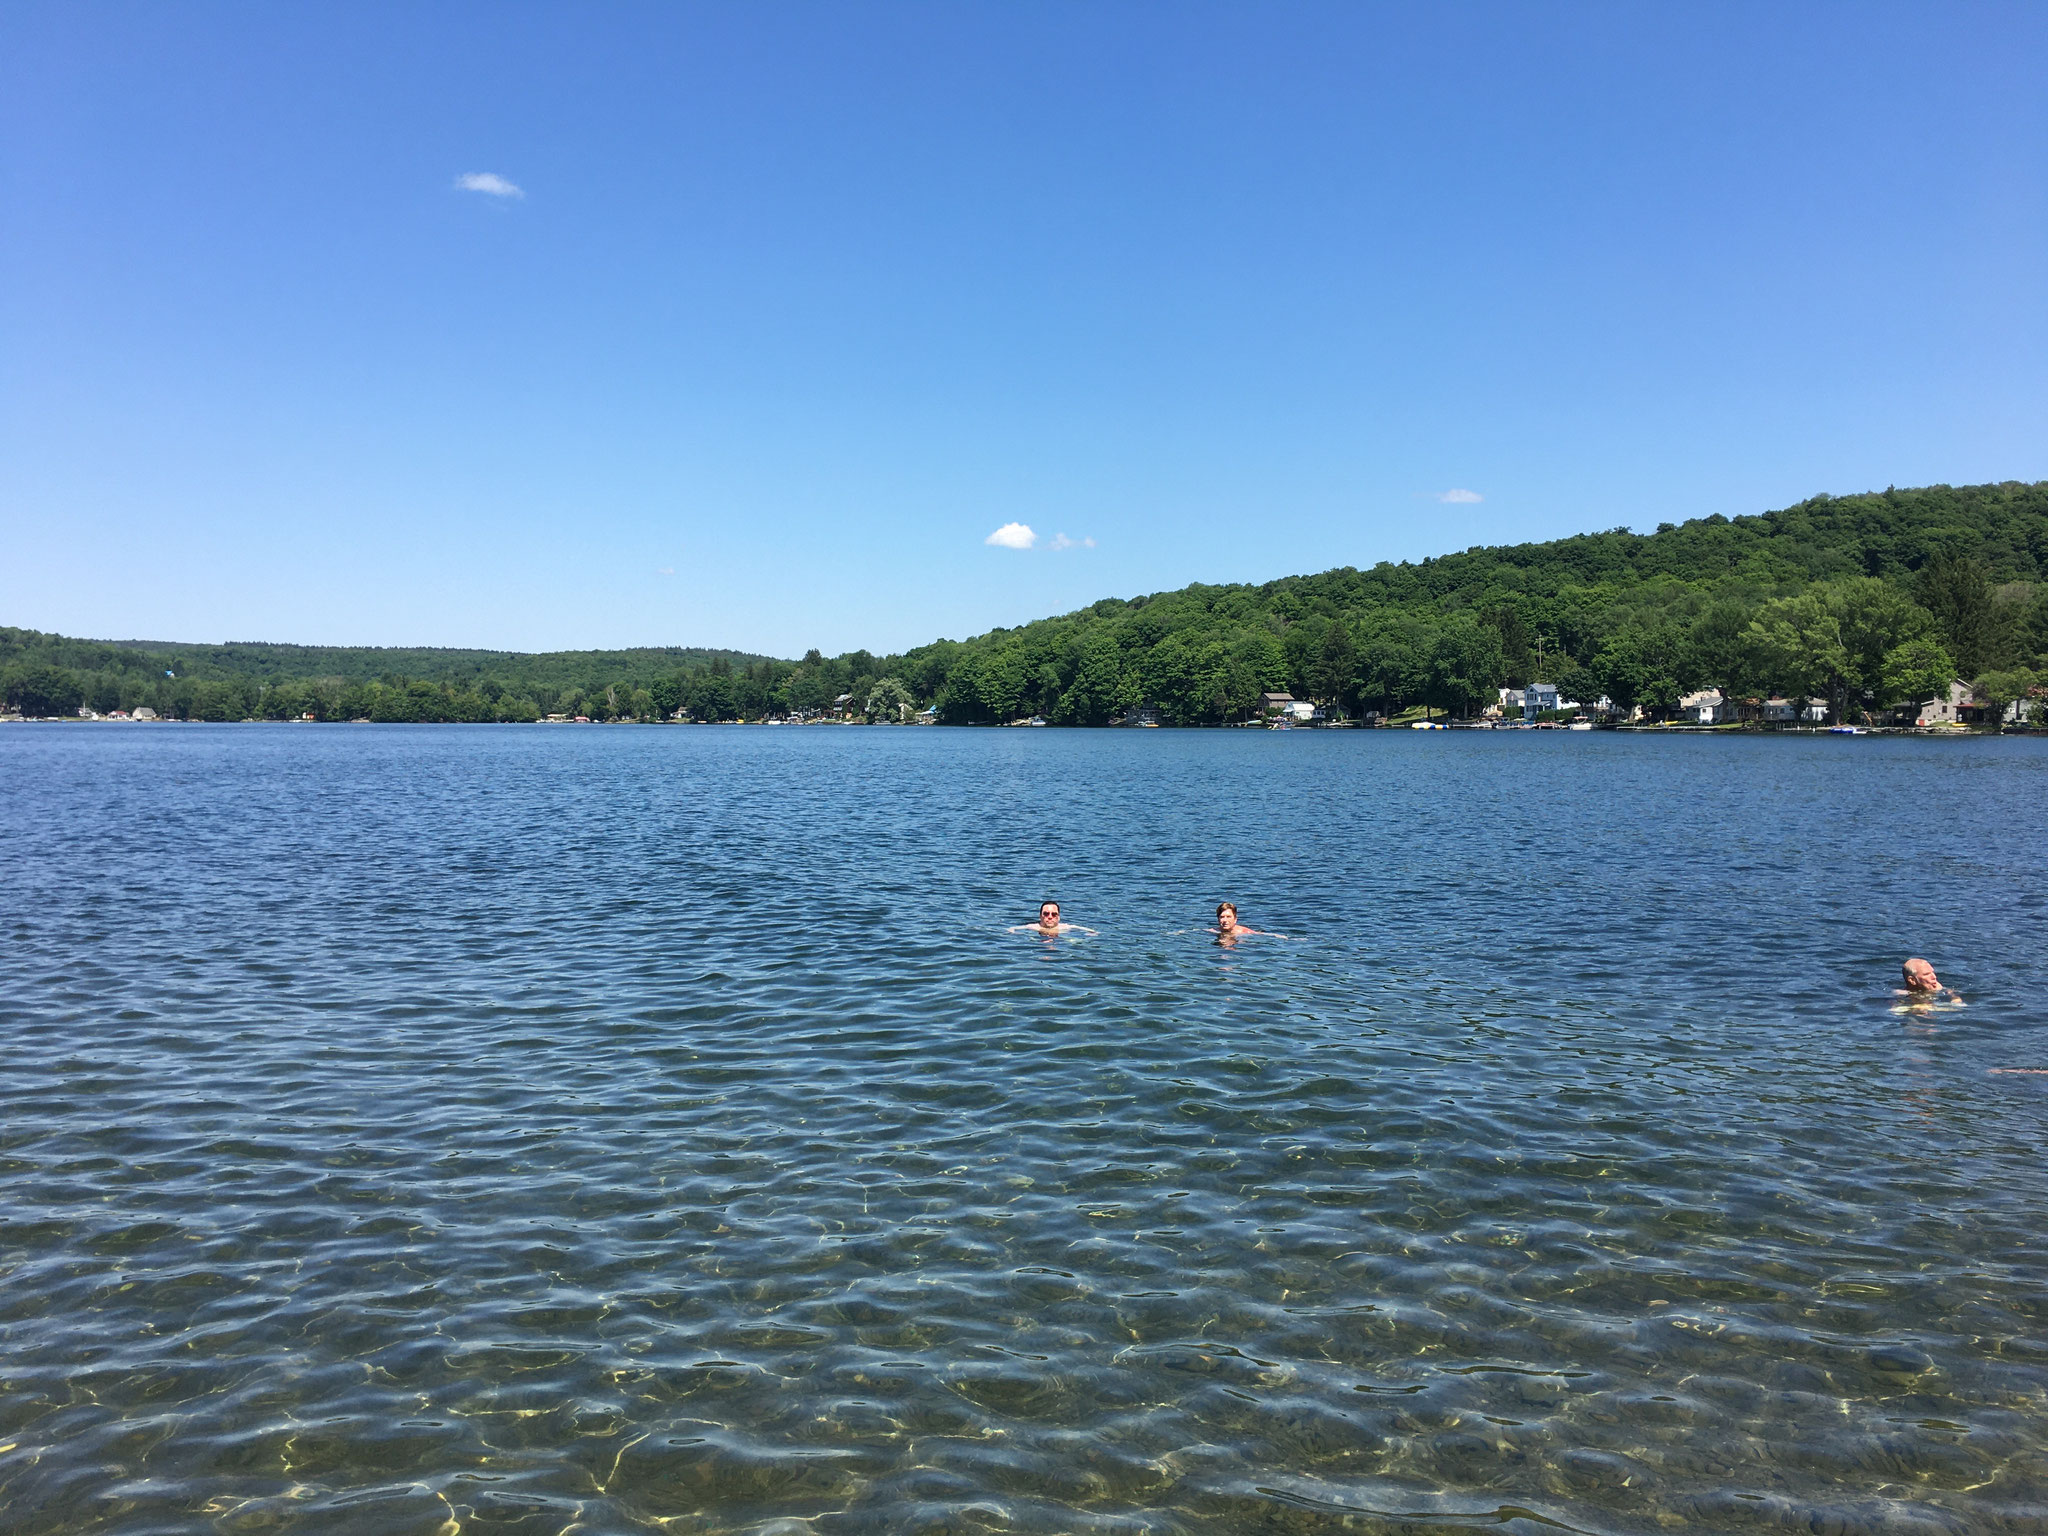 Greg & John swimming, 7-4-2020